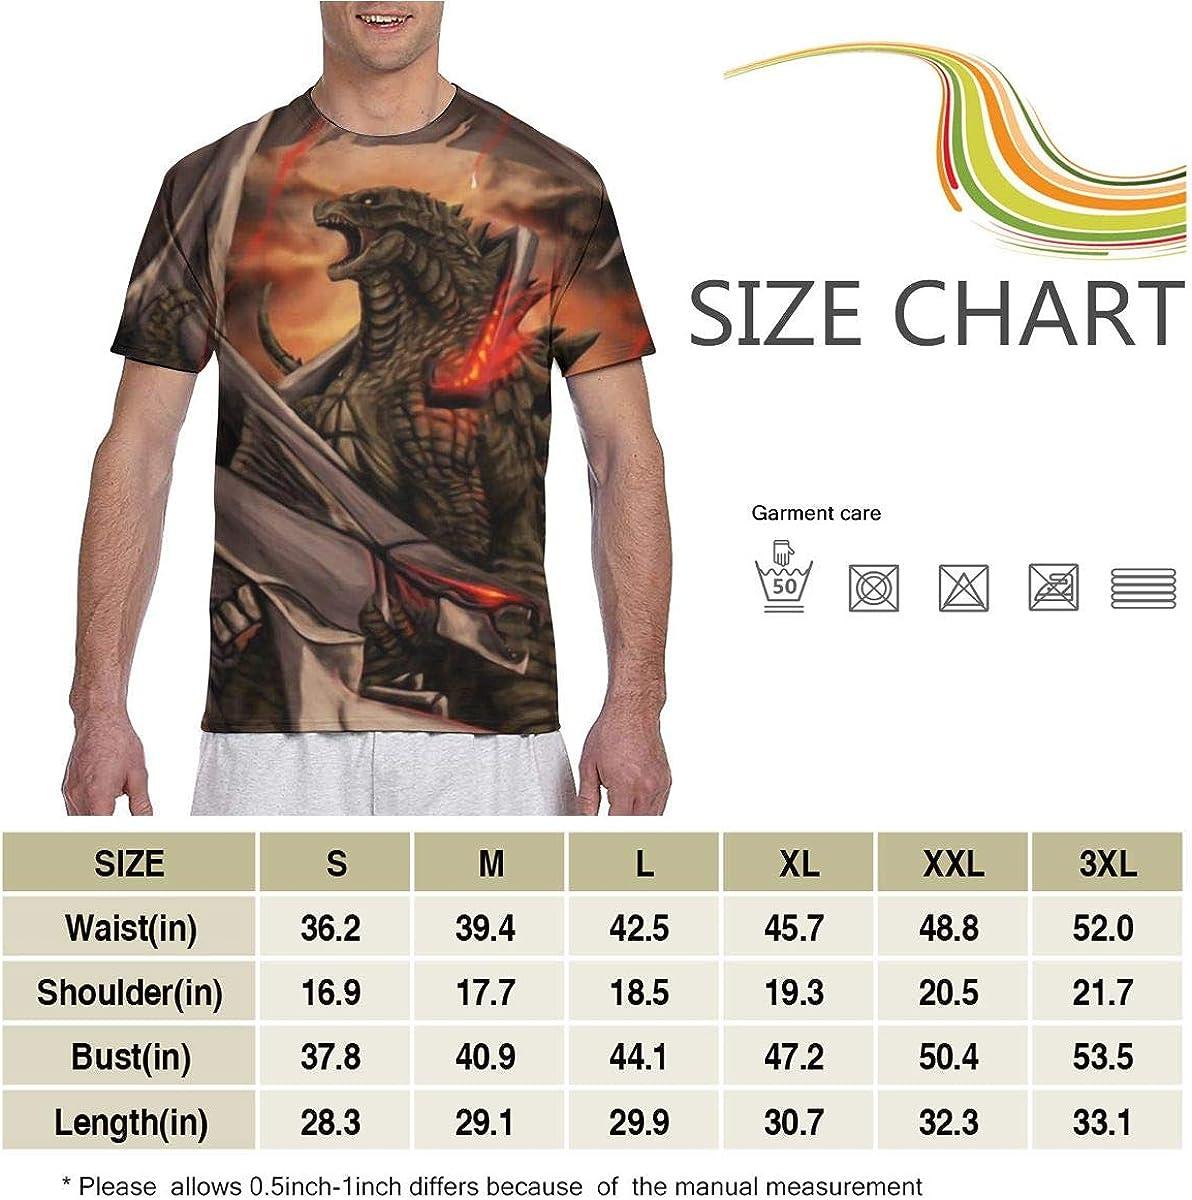 PX DIY SHOP Men Tops Adult Autumn T-Shirts Crewneck Short Sleeve Colorful Graphic Print Top Tees